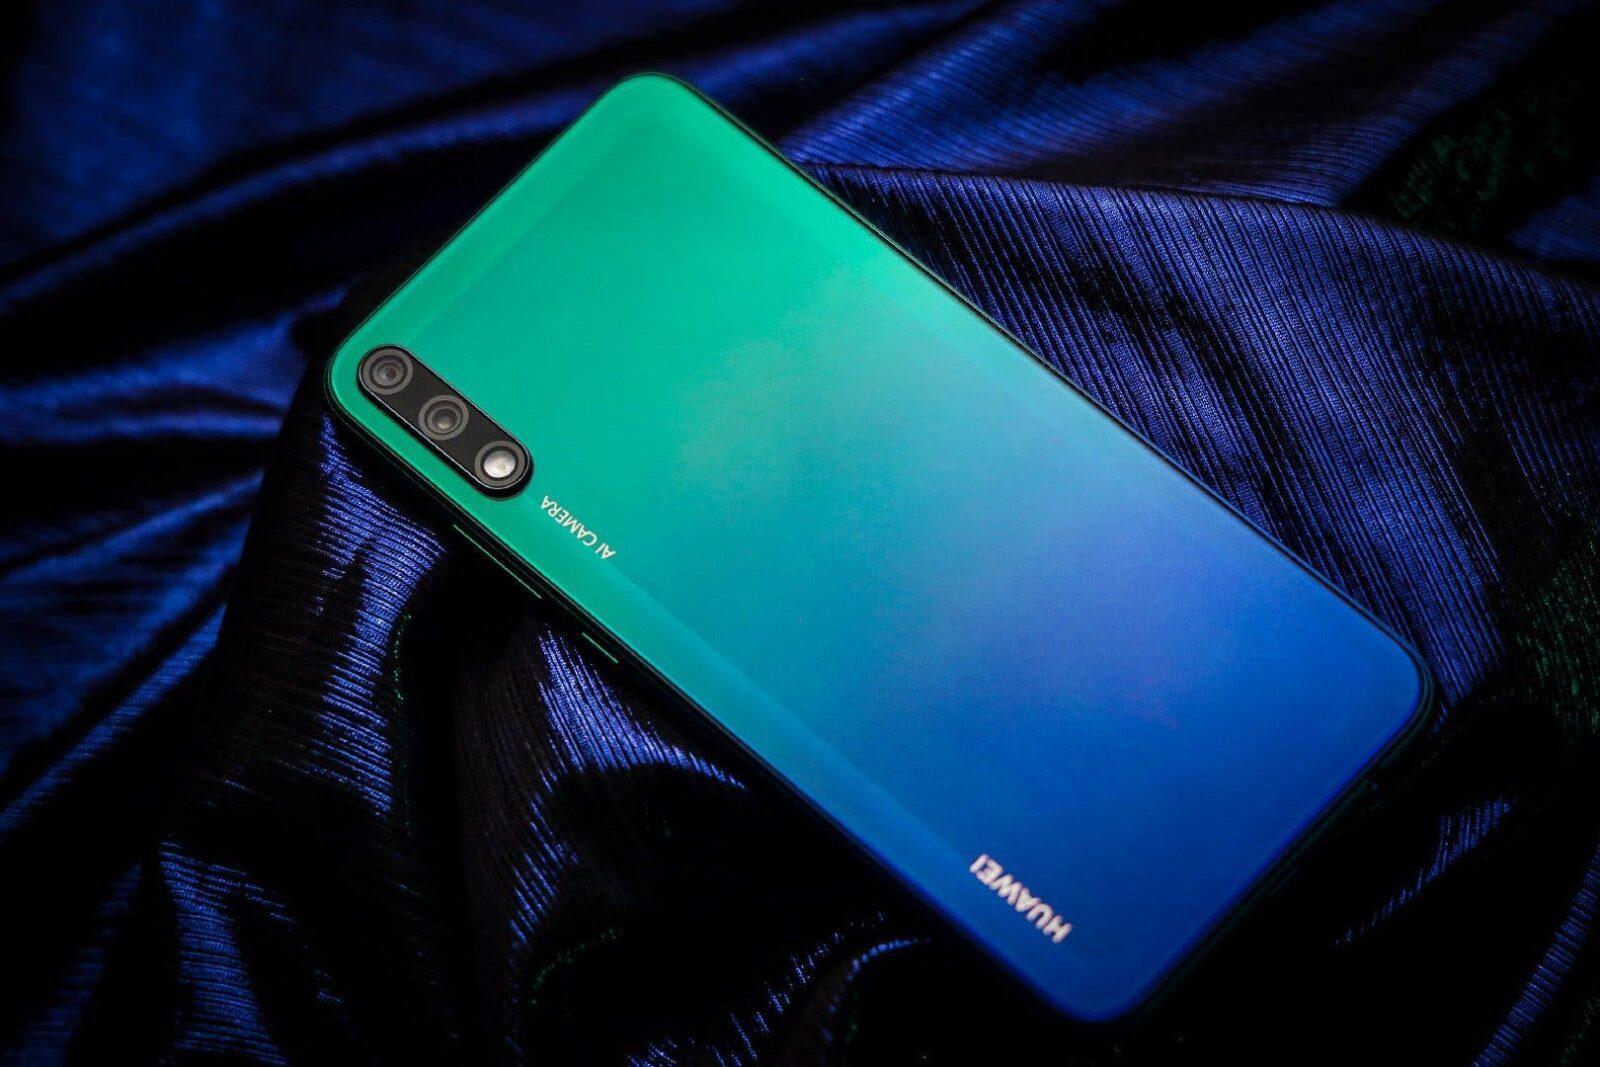 Huawei готовится к запуску нового устройства на базе Dimensity 700 (huawei nova 5z)